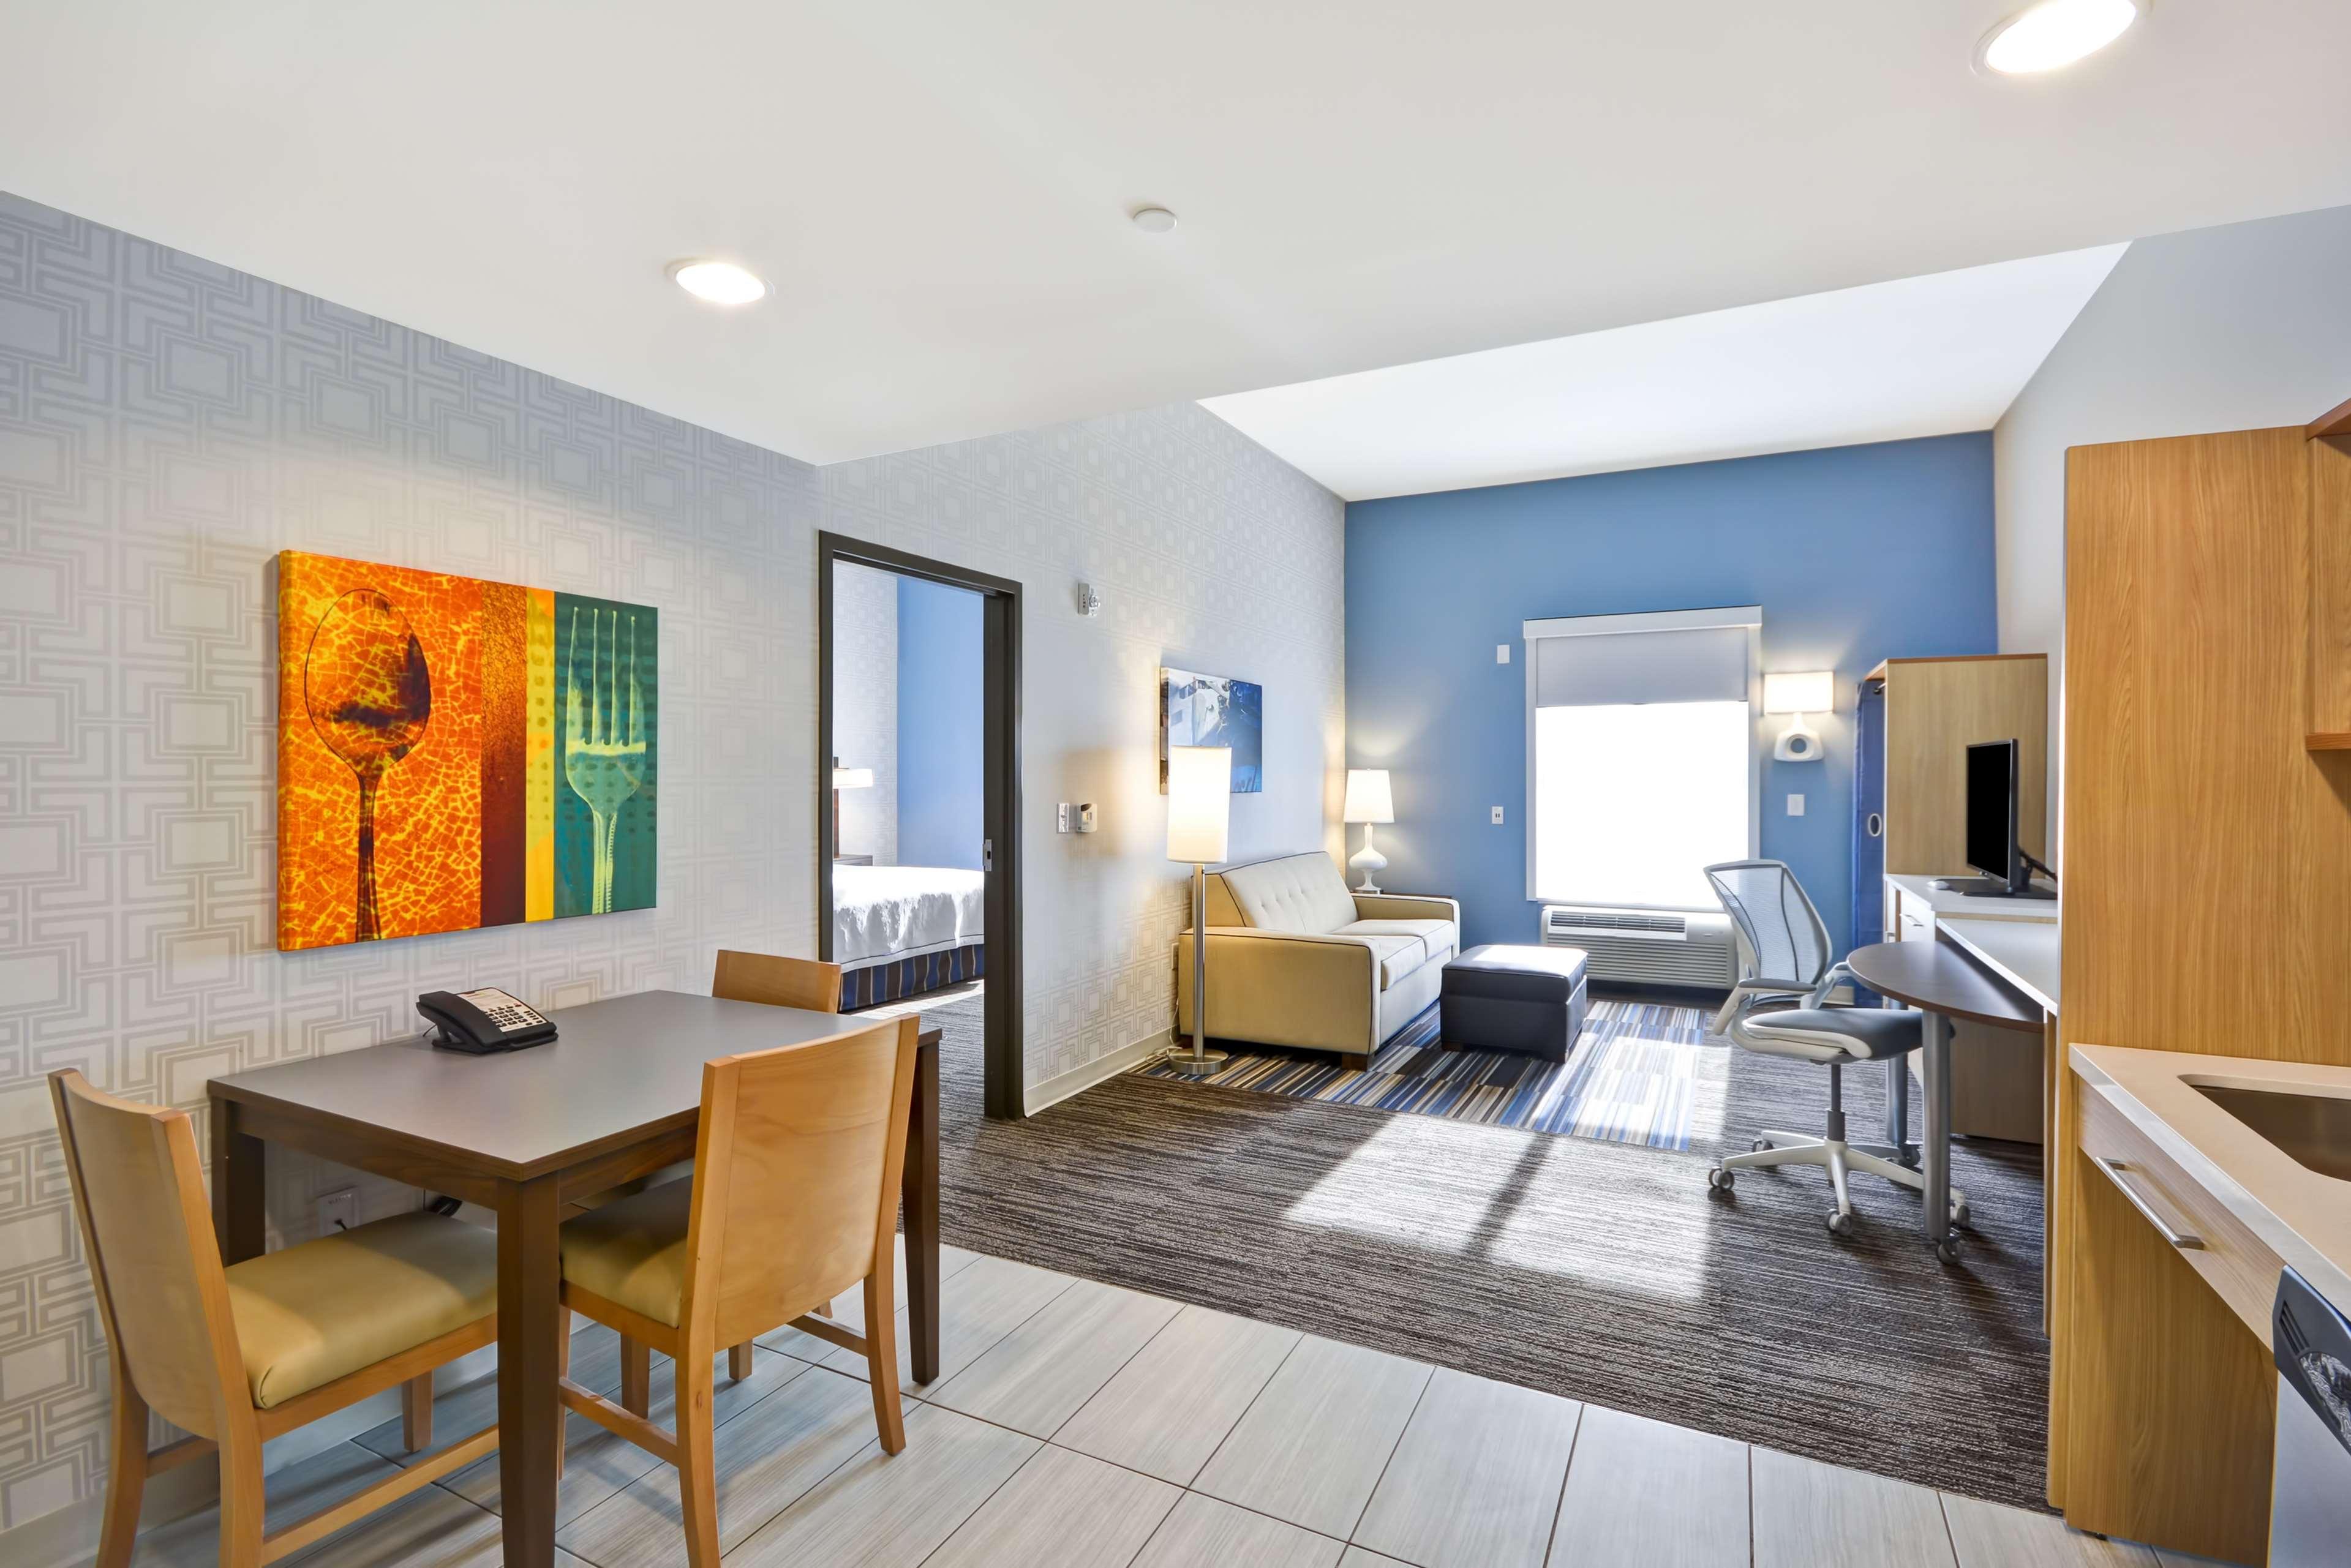 Home2 Suites by Hilton  St. Simons Island image 34